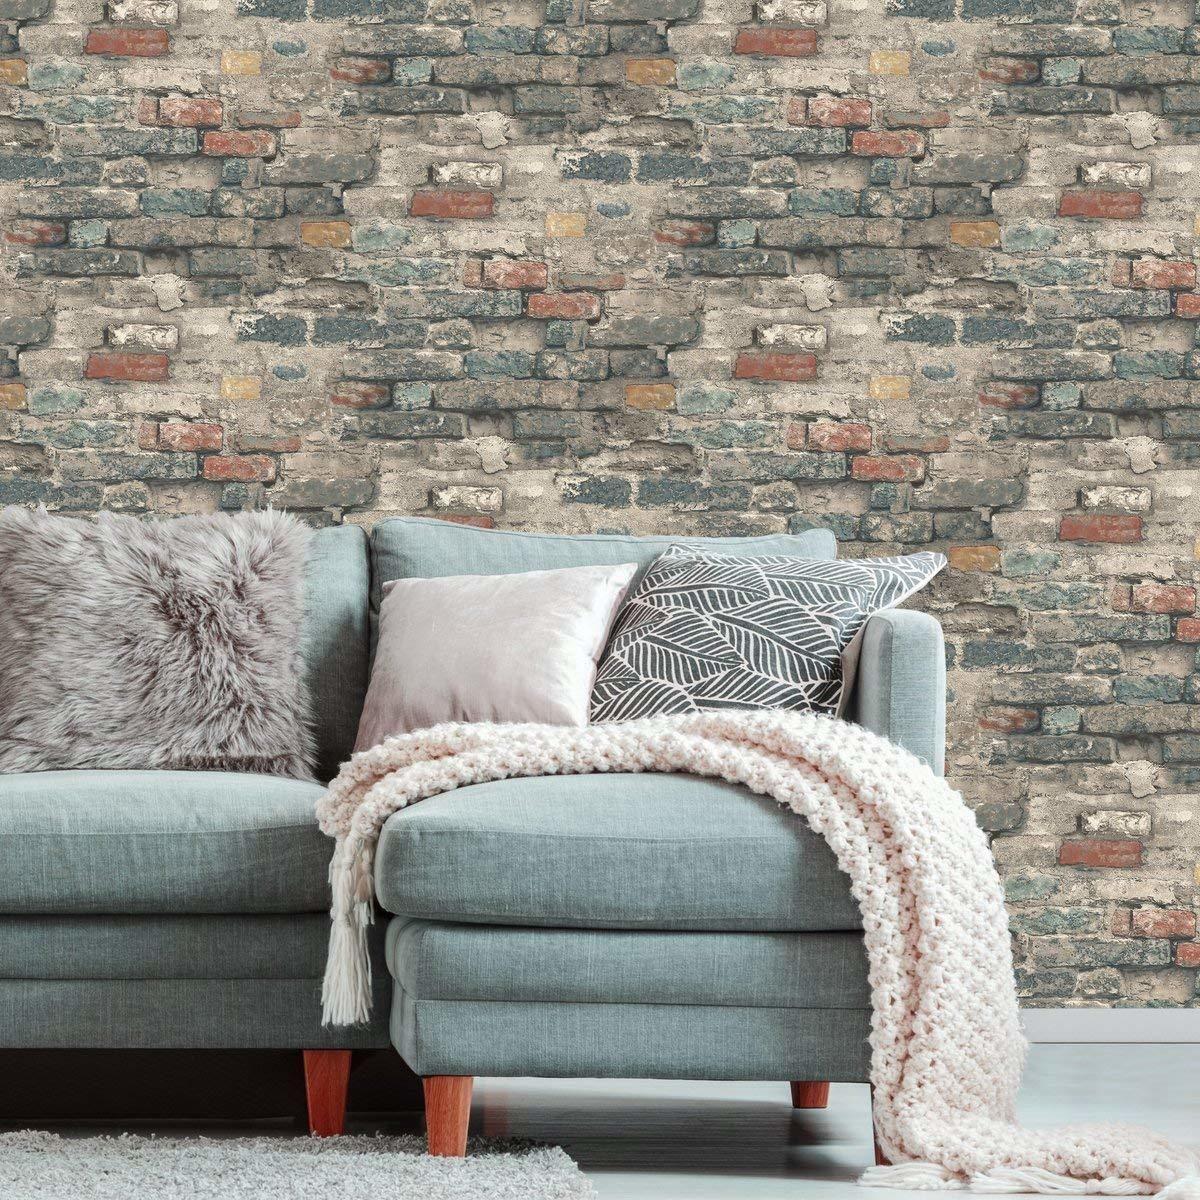 RoomMates RMK11080WP Brick Alley Peel & Stick Wallpaper ...